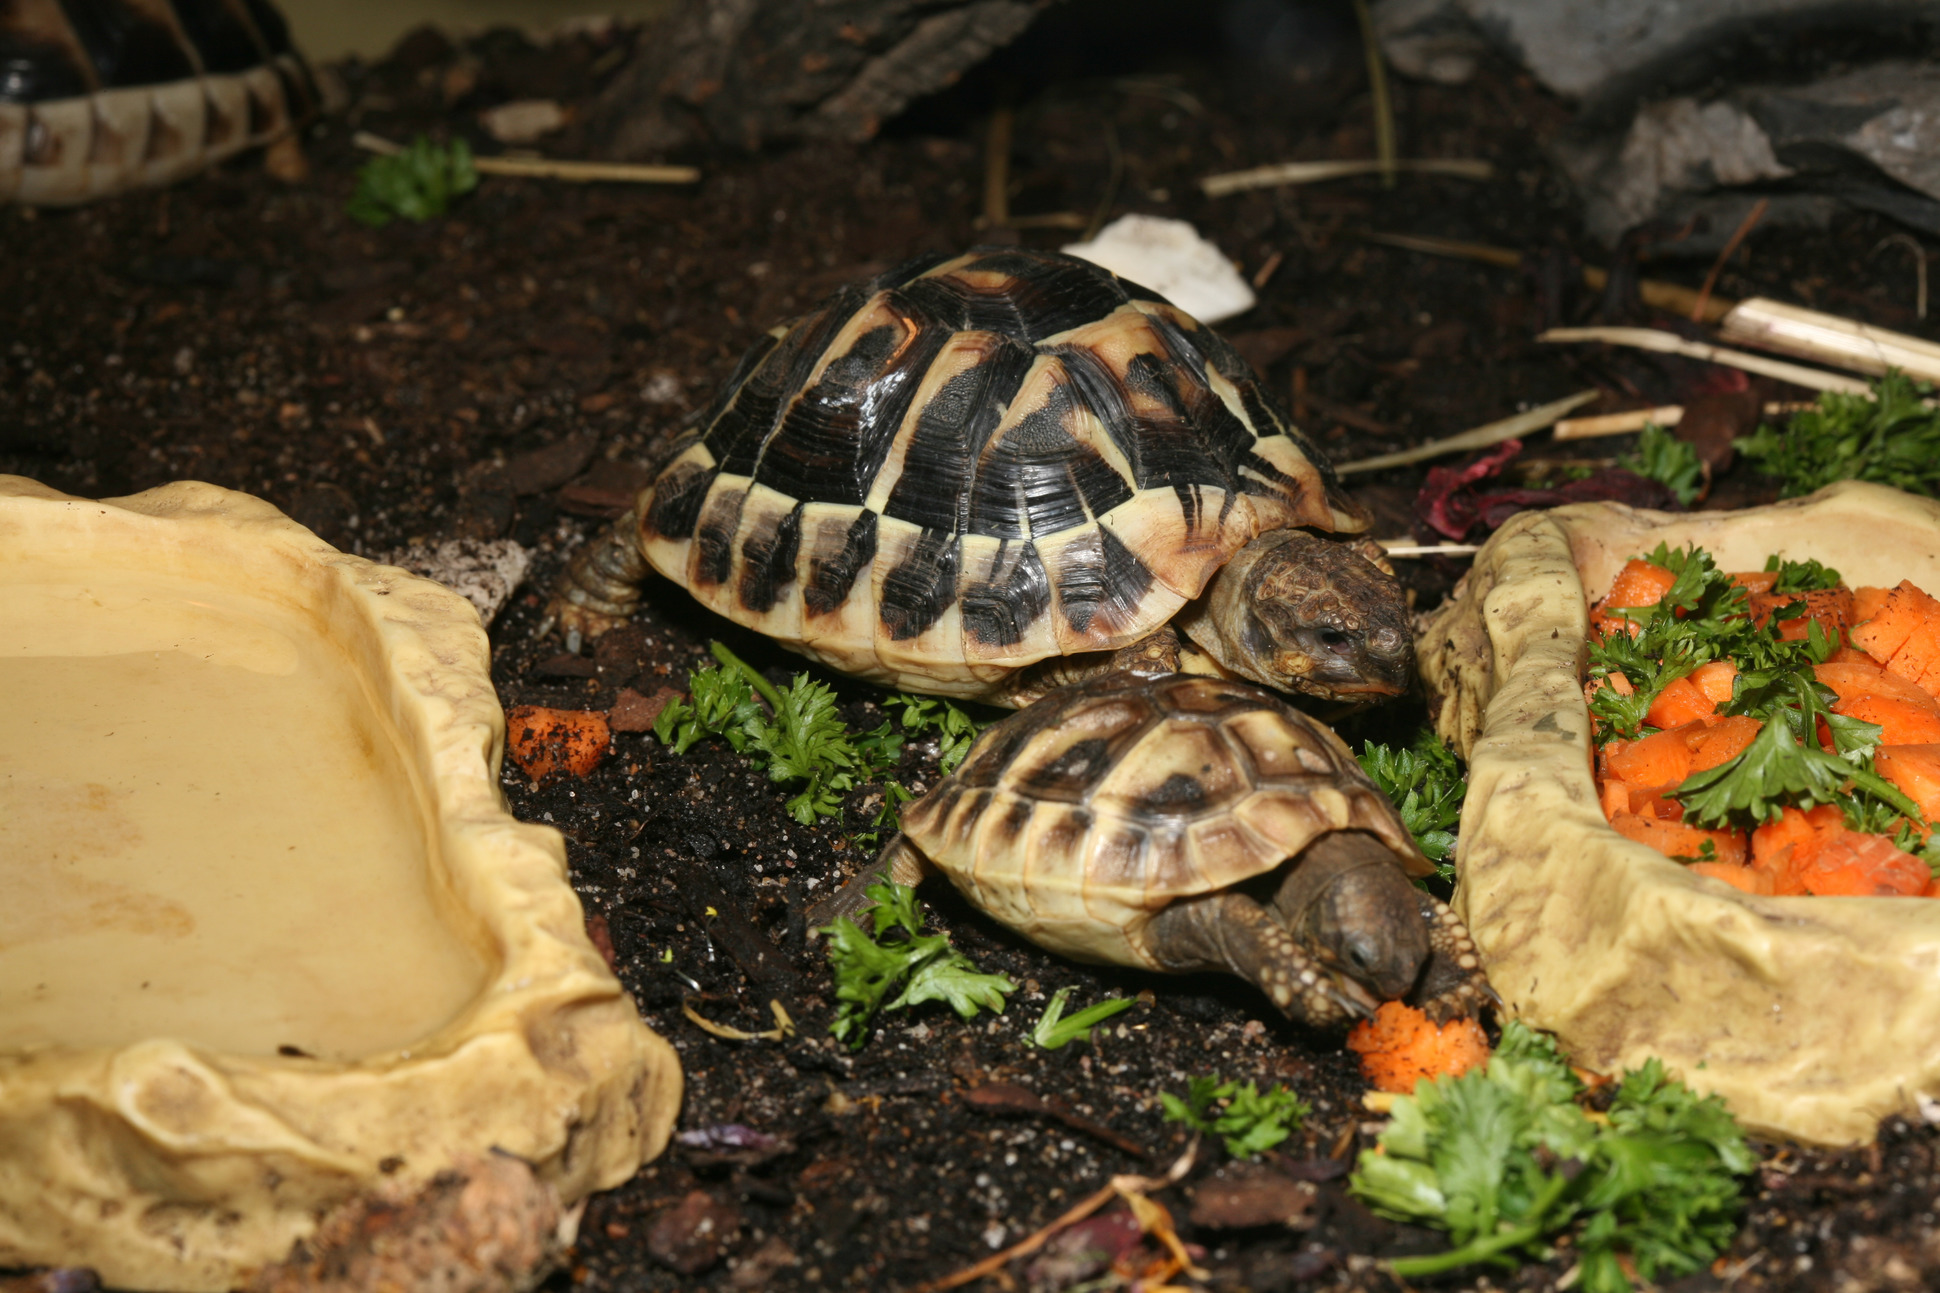 террариум для среднеазиатской черепахи фото